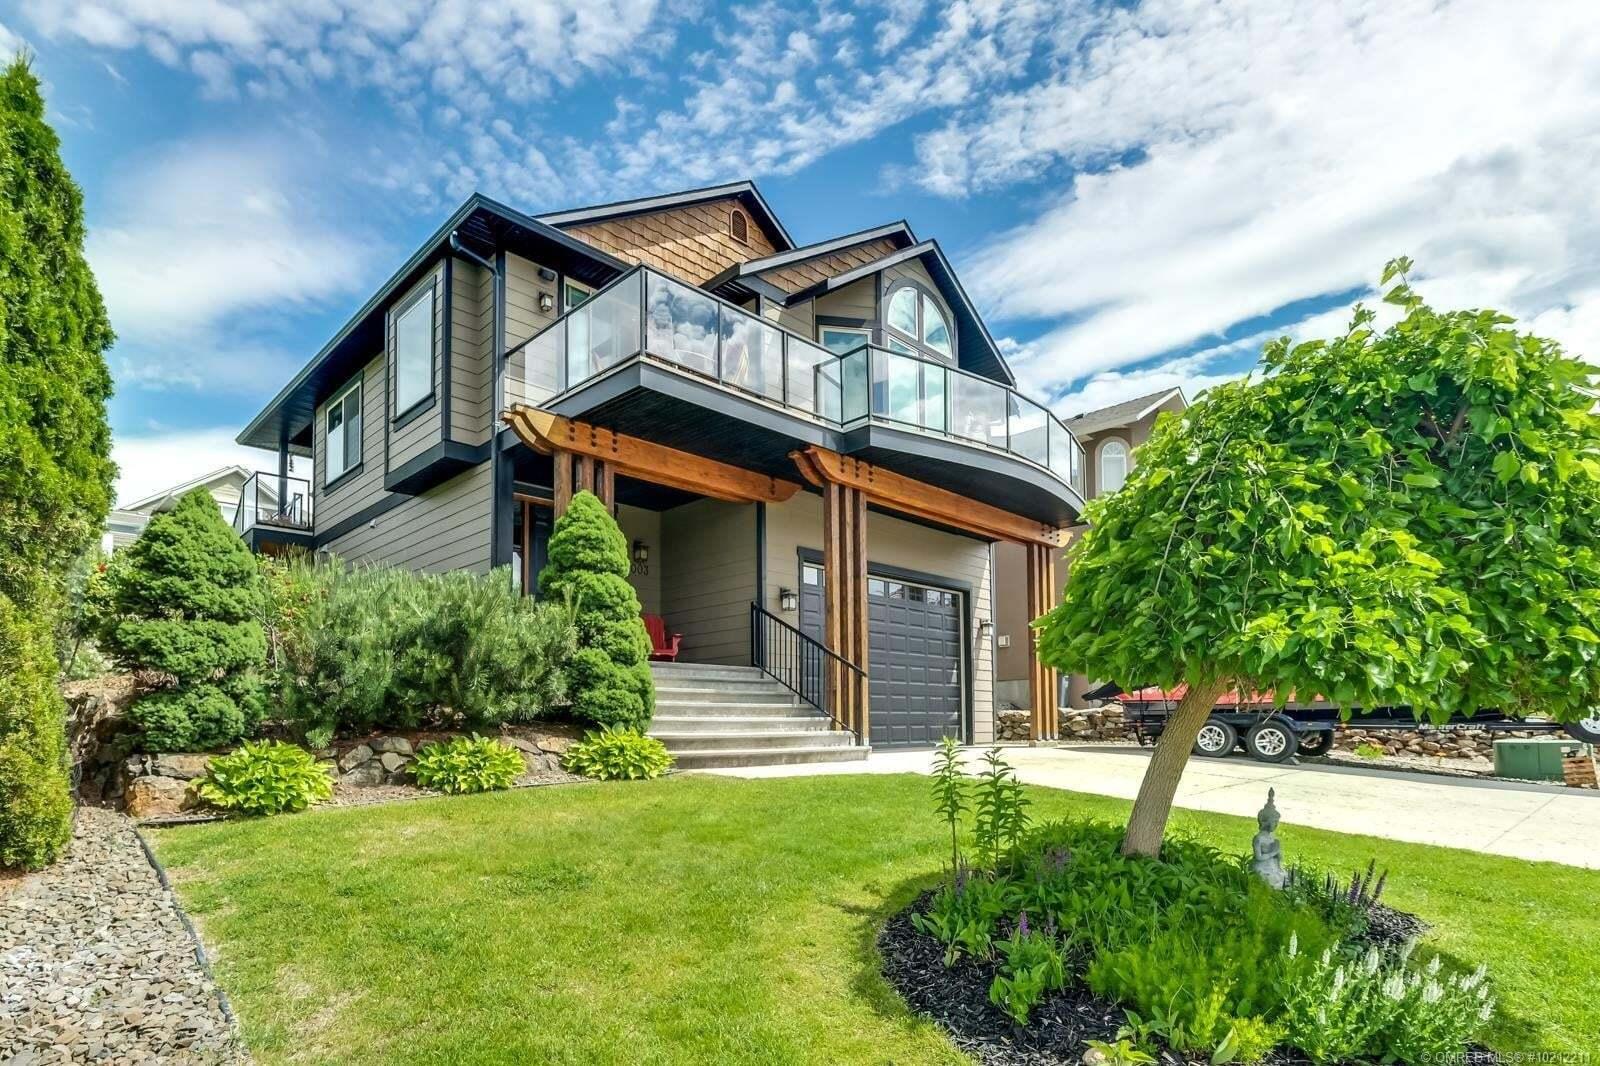 House for sale at 5003 France Ct Kelowna British Columbia - MLS: 10212211